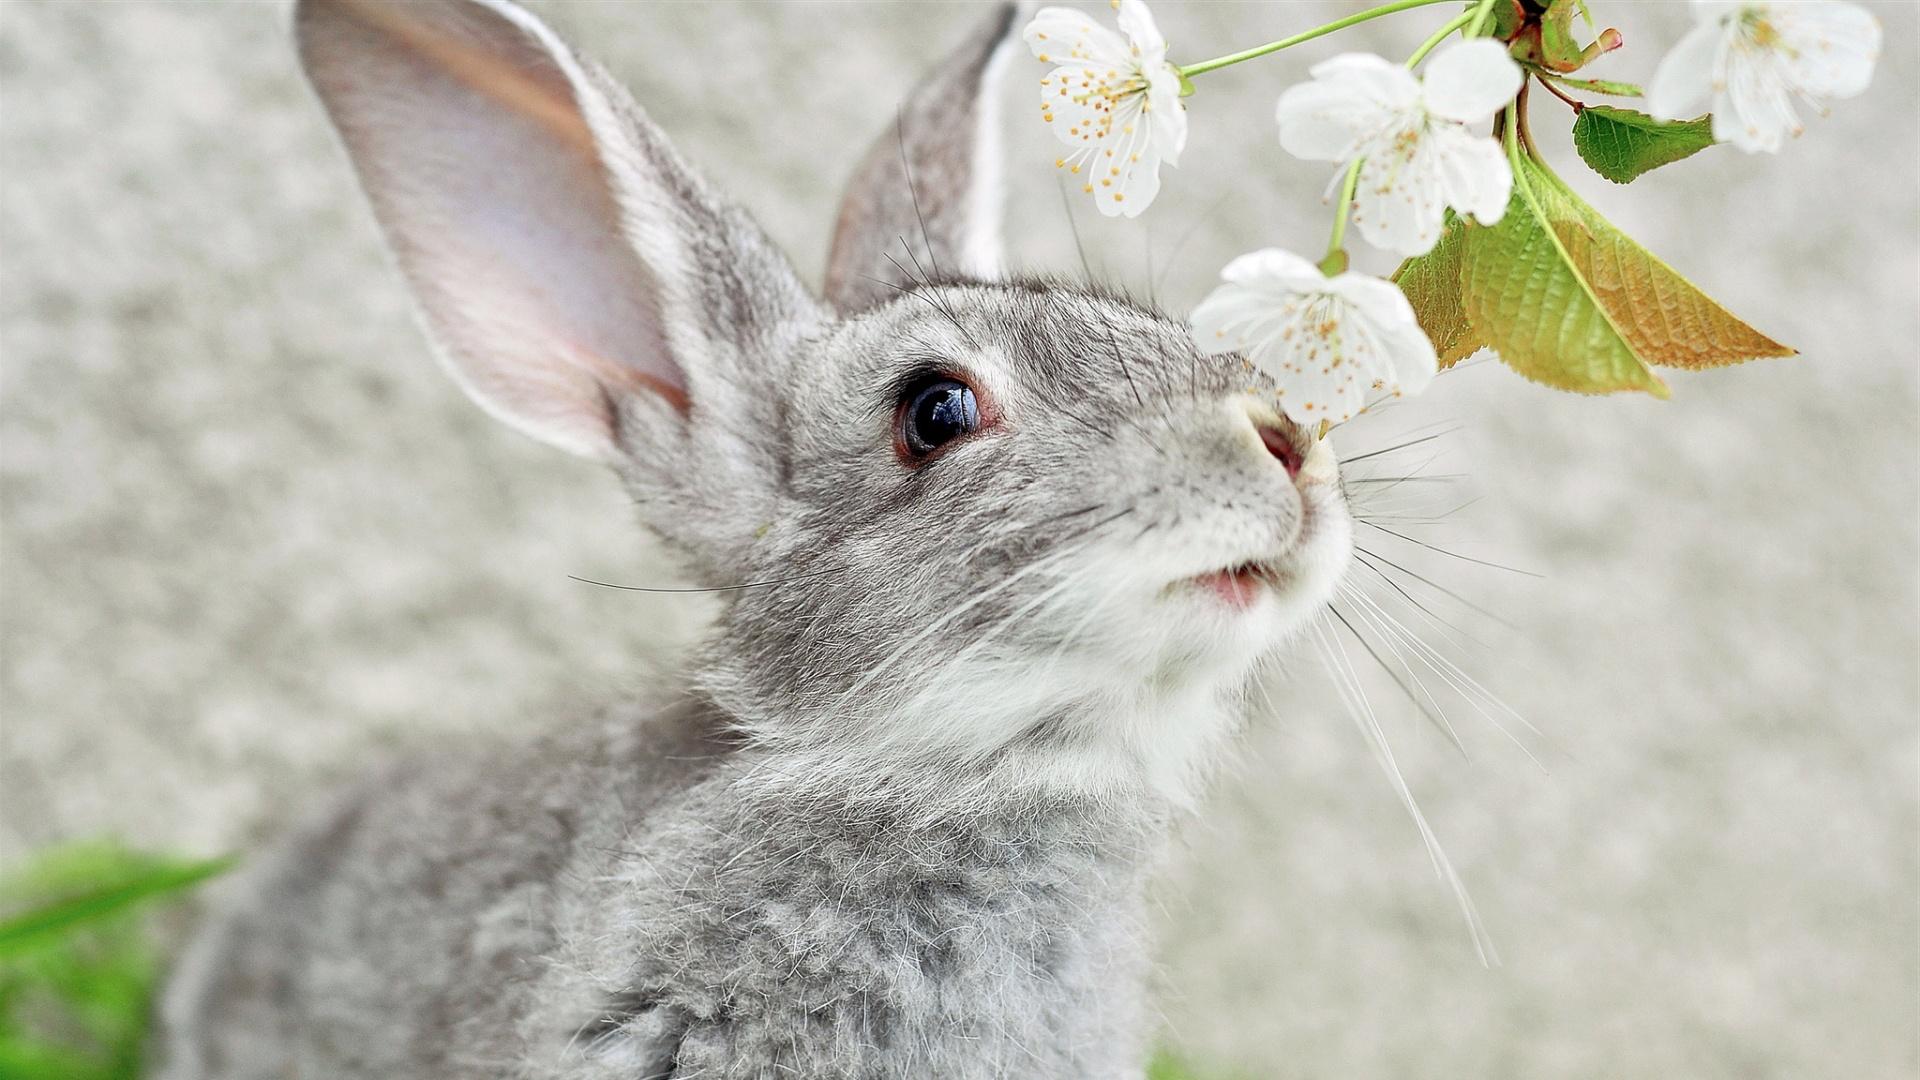 beautiful rabbits images